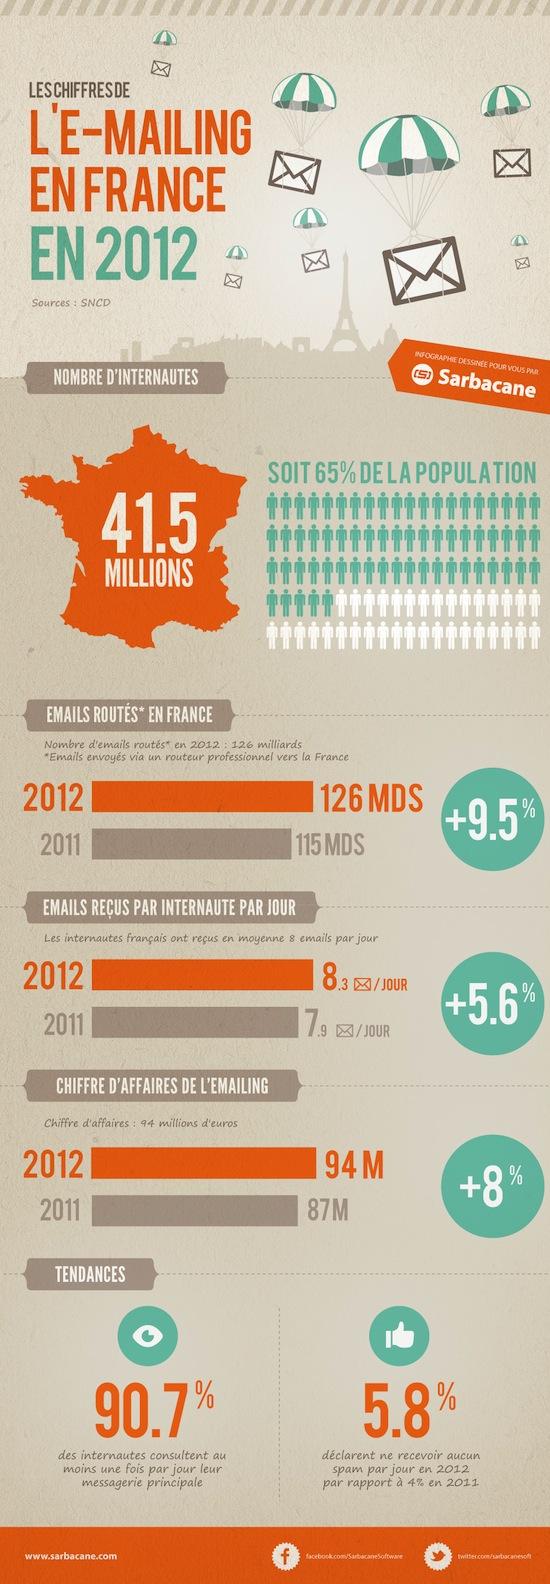 infographie1-1